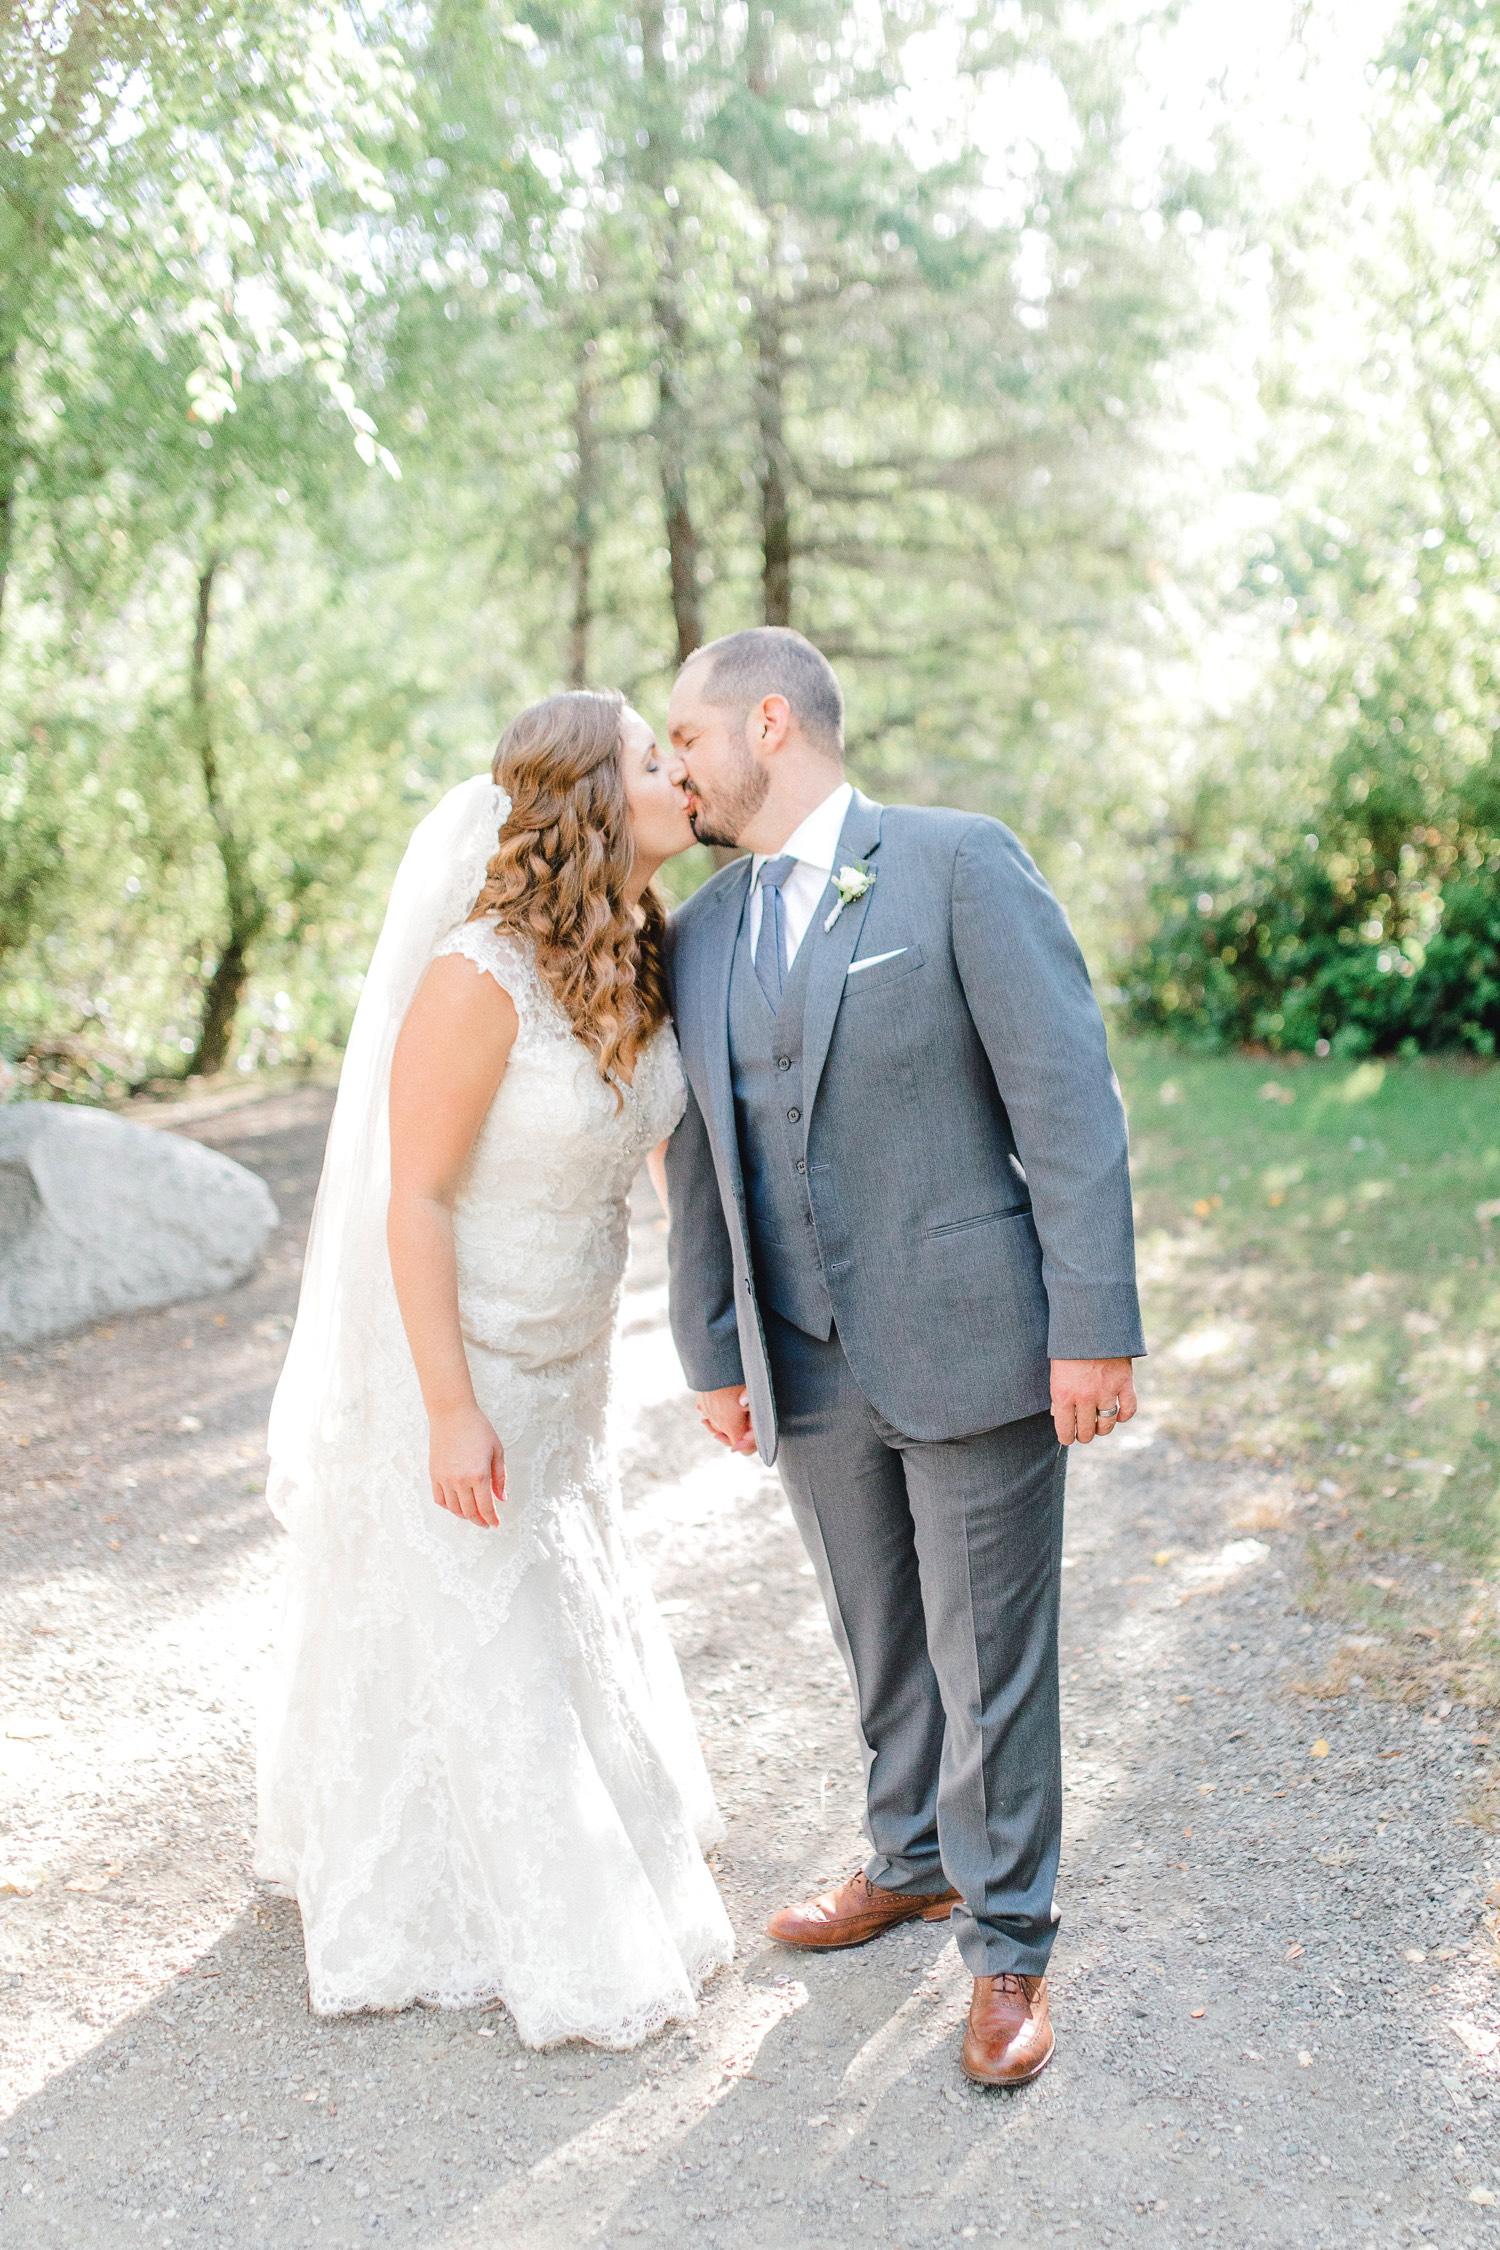 0000000000083_emmarosecompany_katiematt-4101_Photographer_PNW_House_Robinswood_Emma_Light_Company_Airy_Rose_and_Wedding_Seattle.jpg